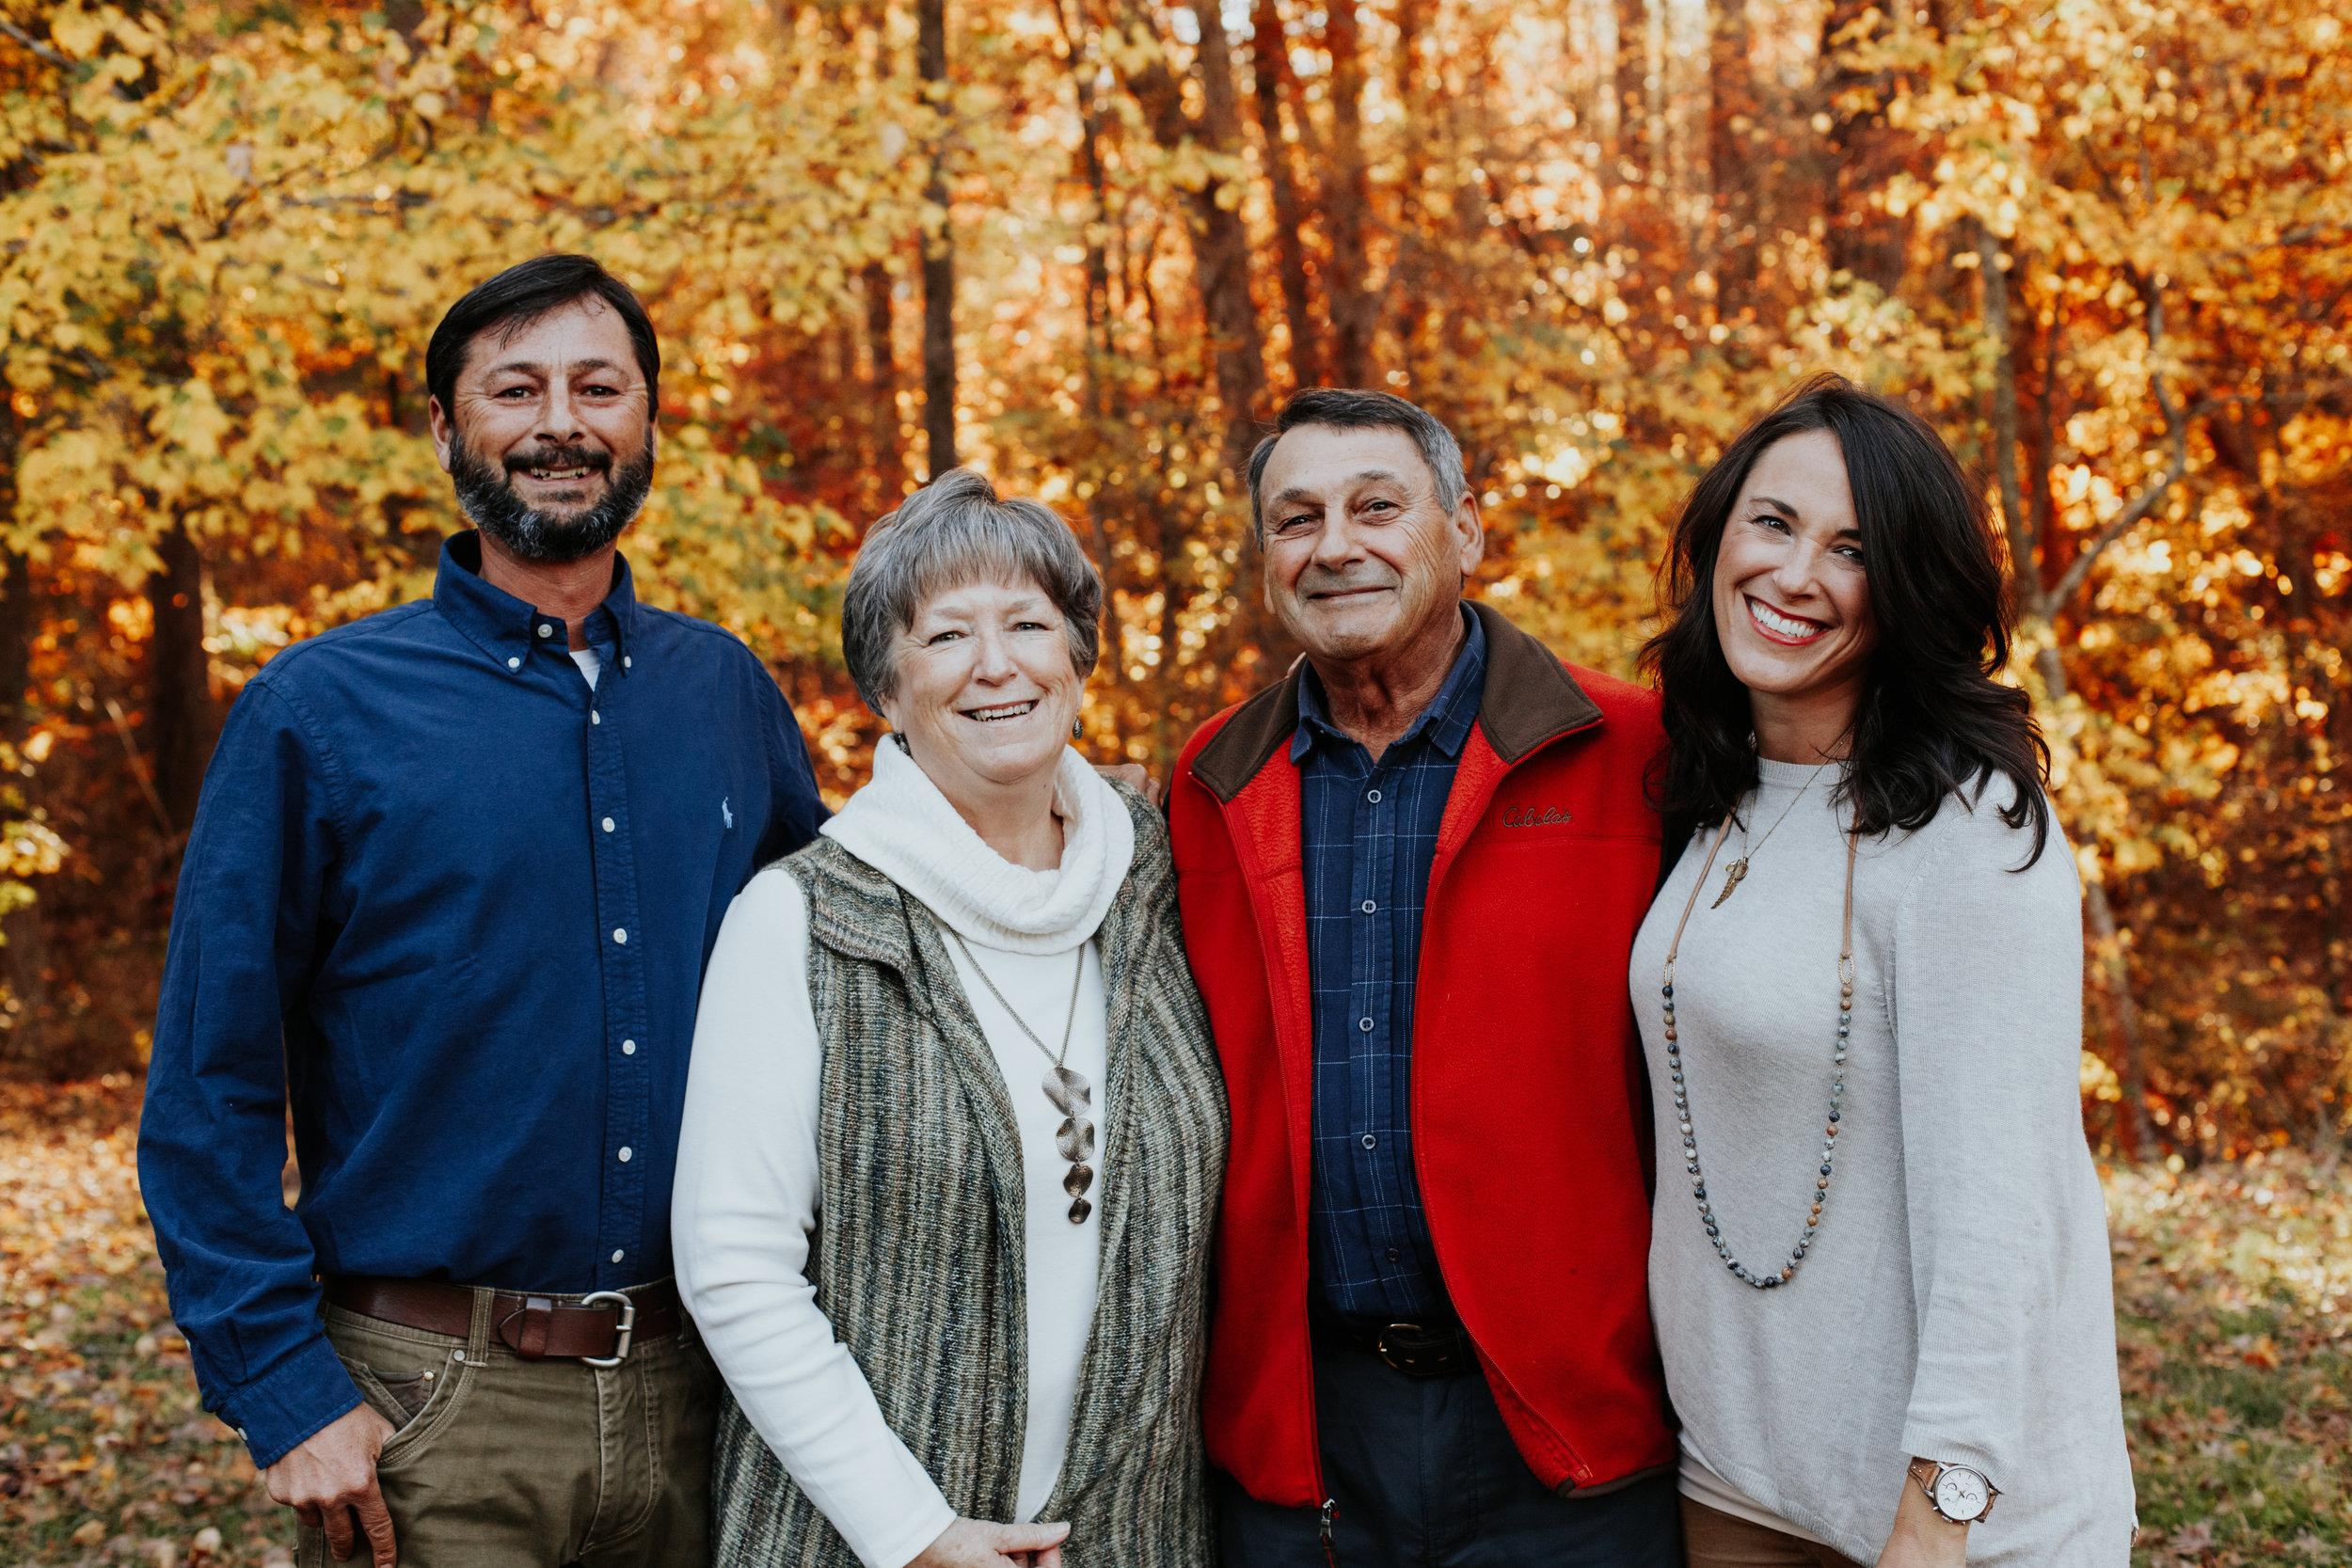 thedavisfamily-7.jpg